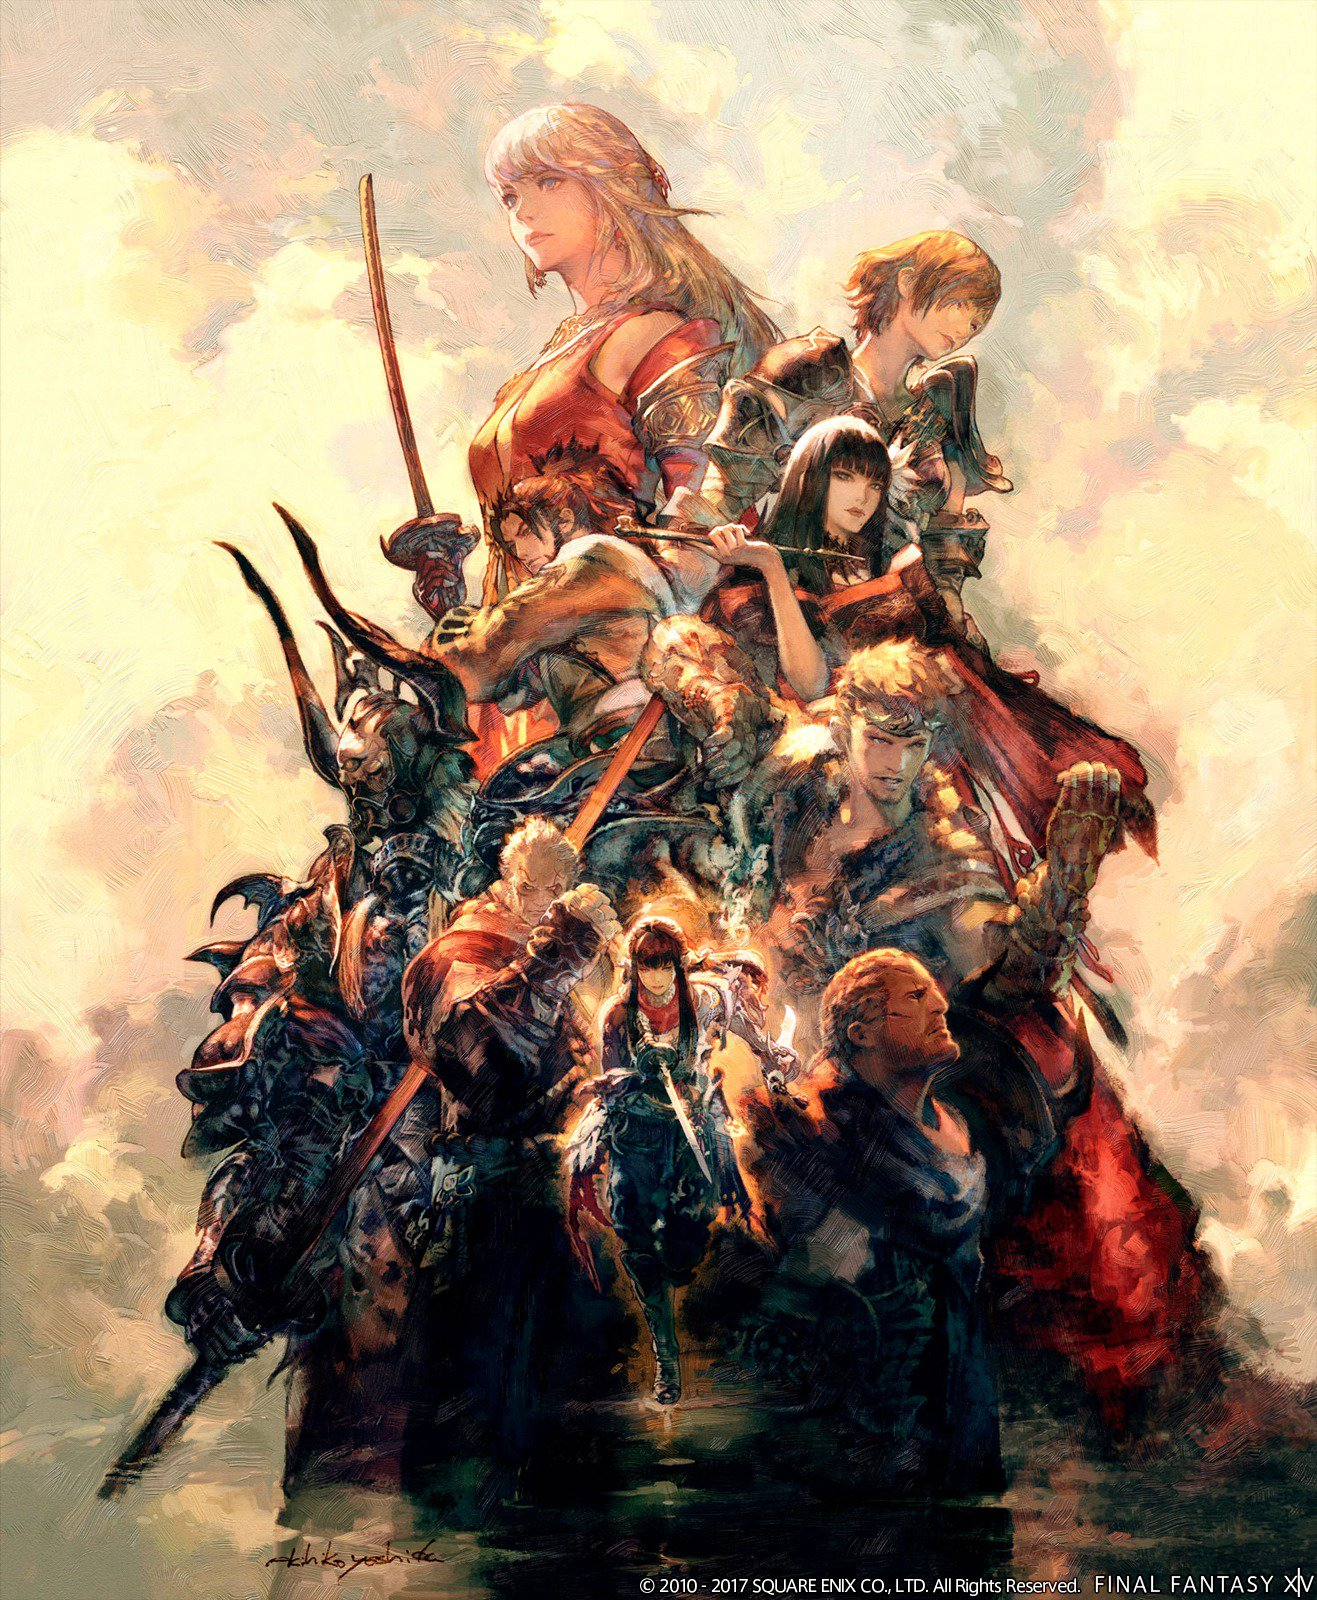 Final Fantasy XIV Stormblood Adds Samurai Job Opening